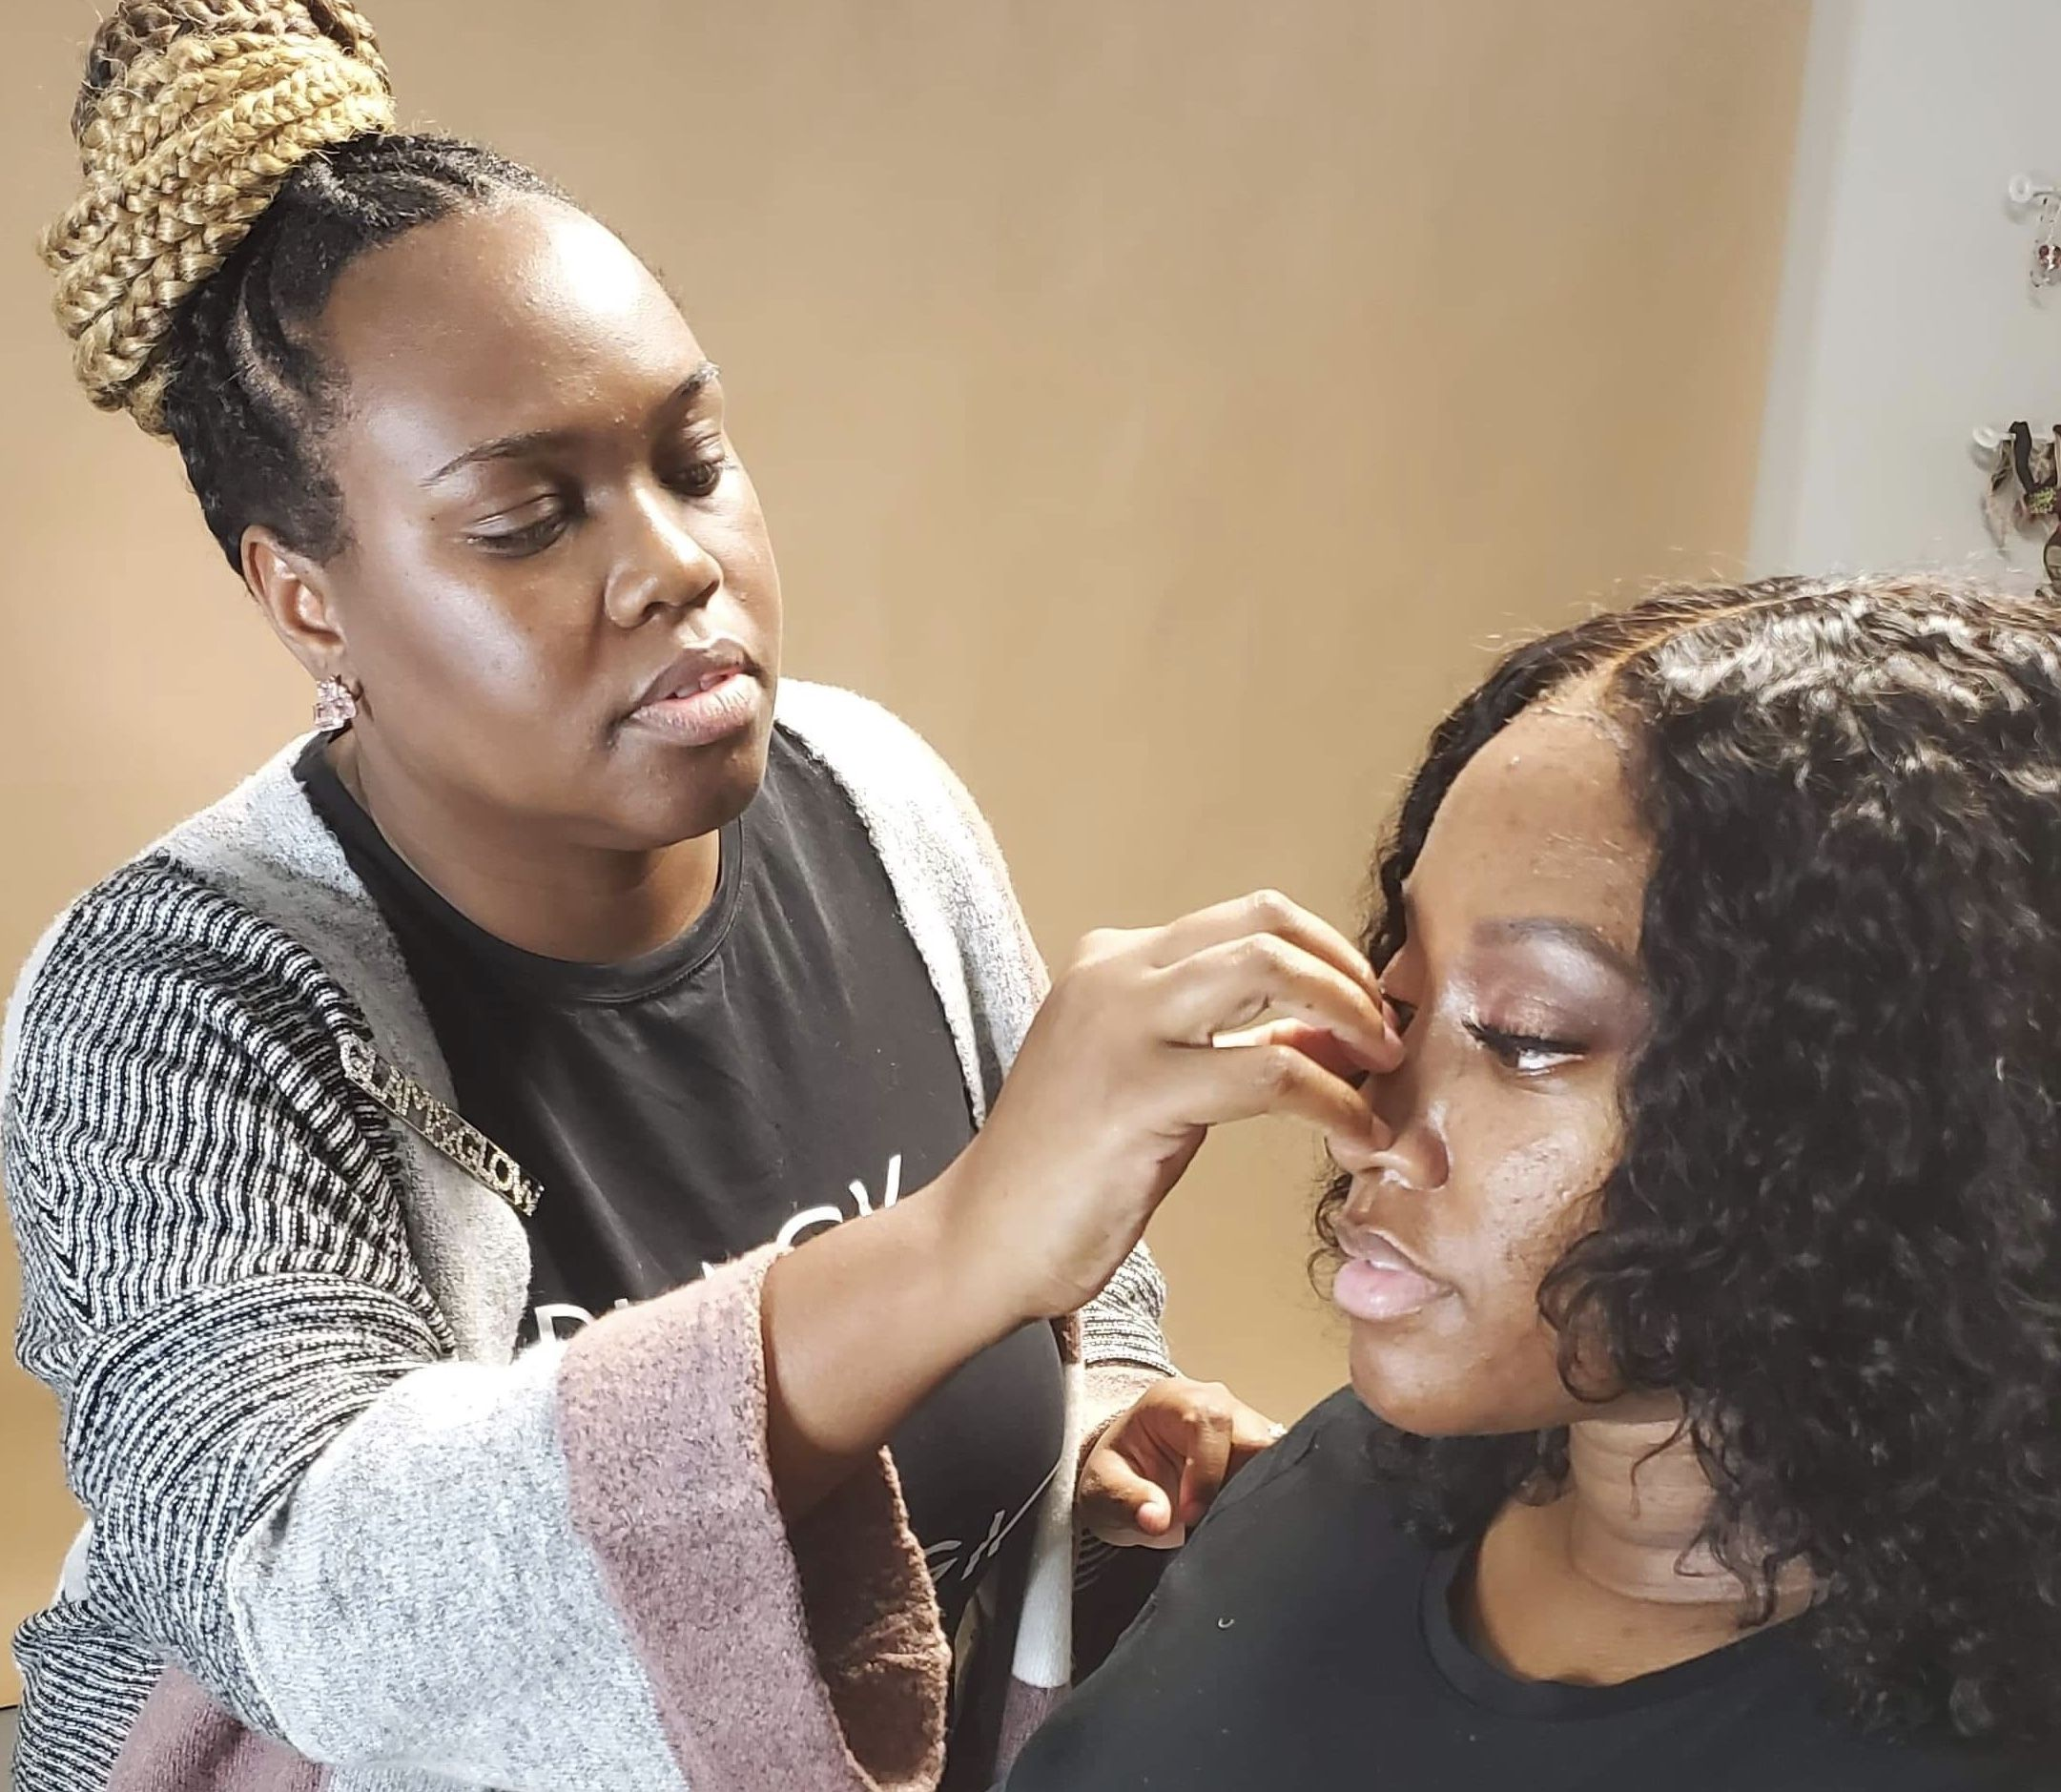 Makeup Services in 2020 Makeup services, Beauty, Esthetician